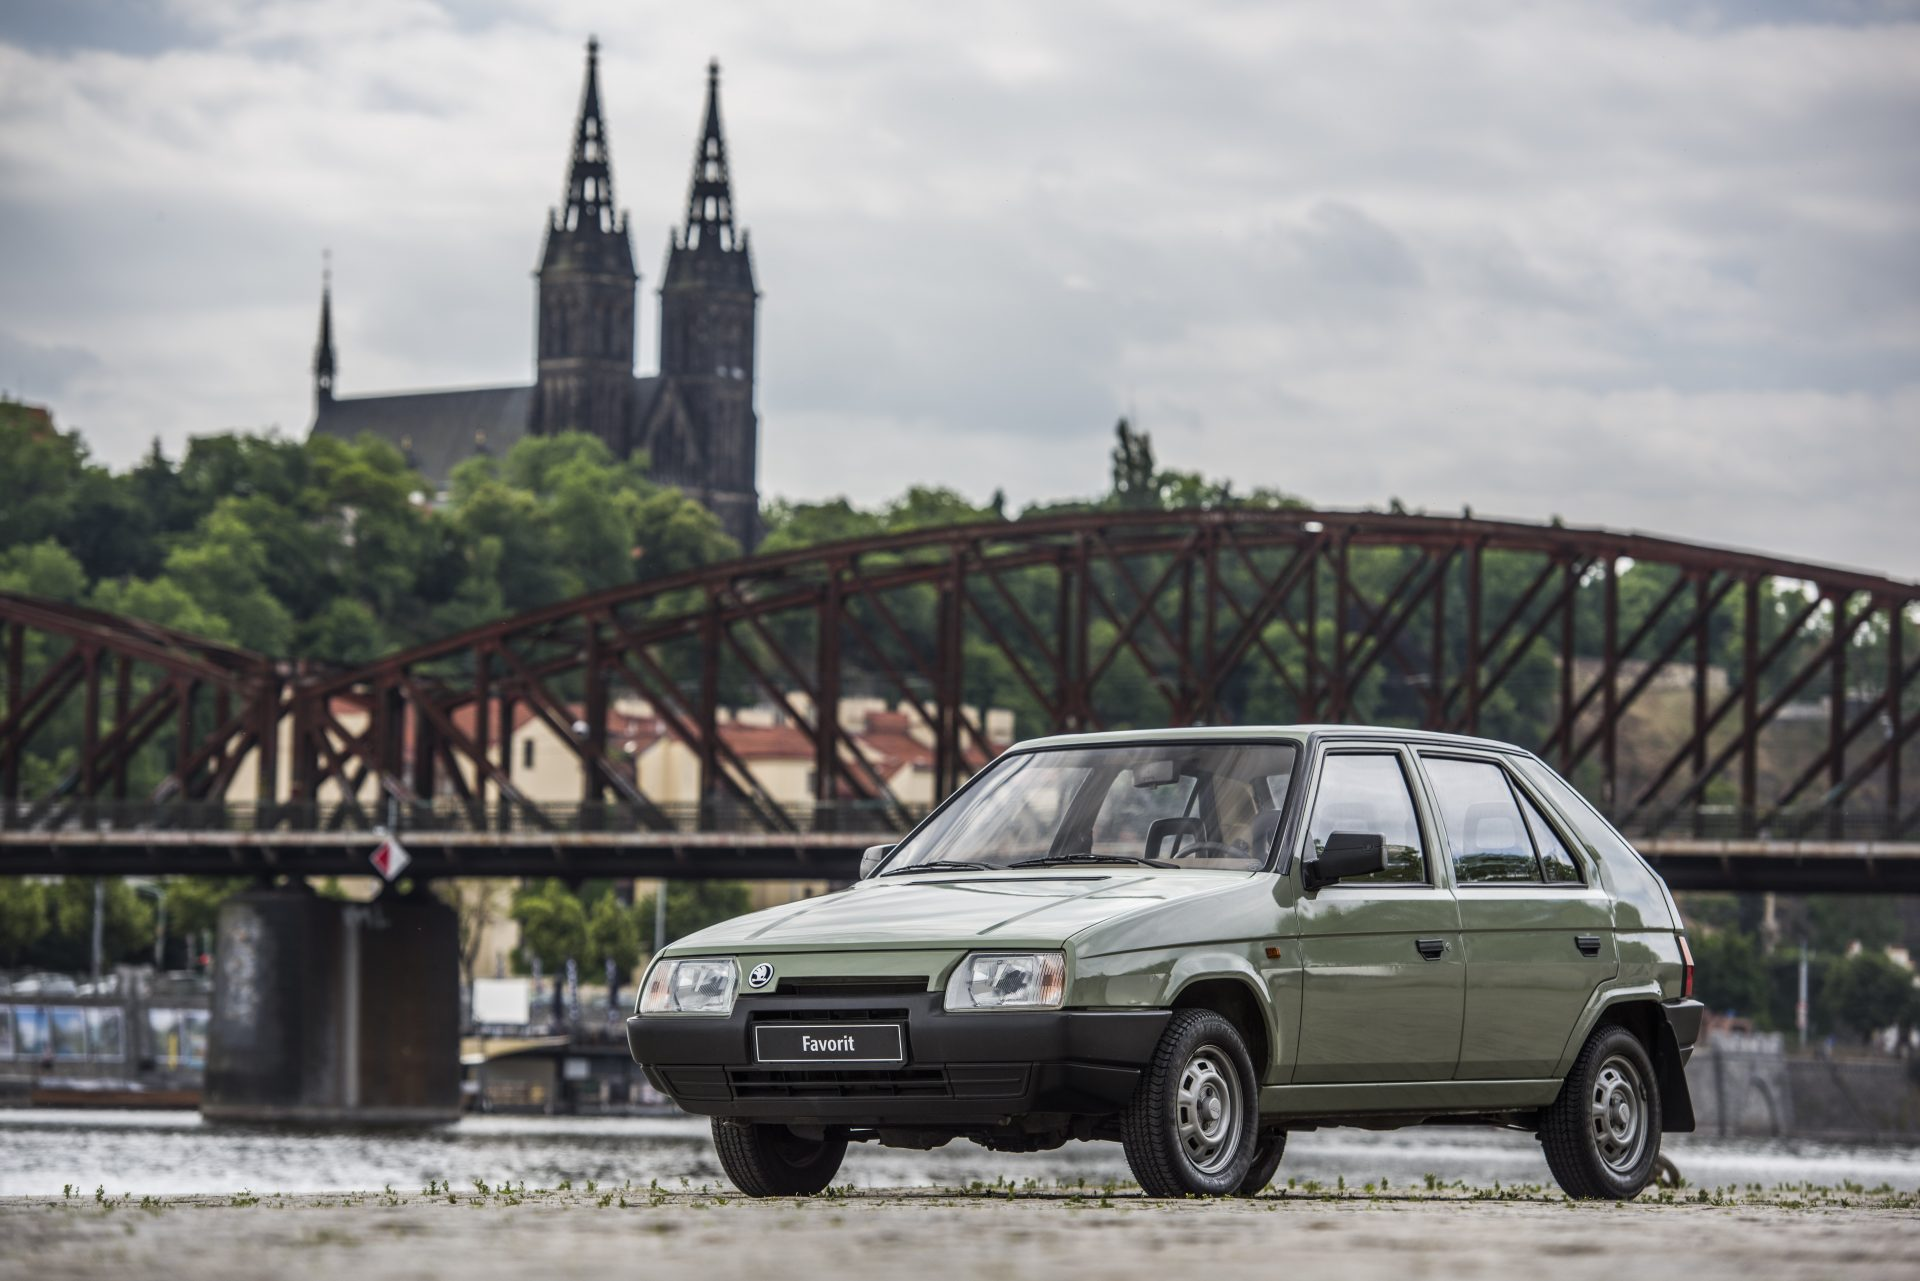 ŠKODA FAVORIT: Entering an era of success 30 years ago